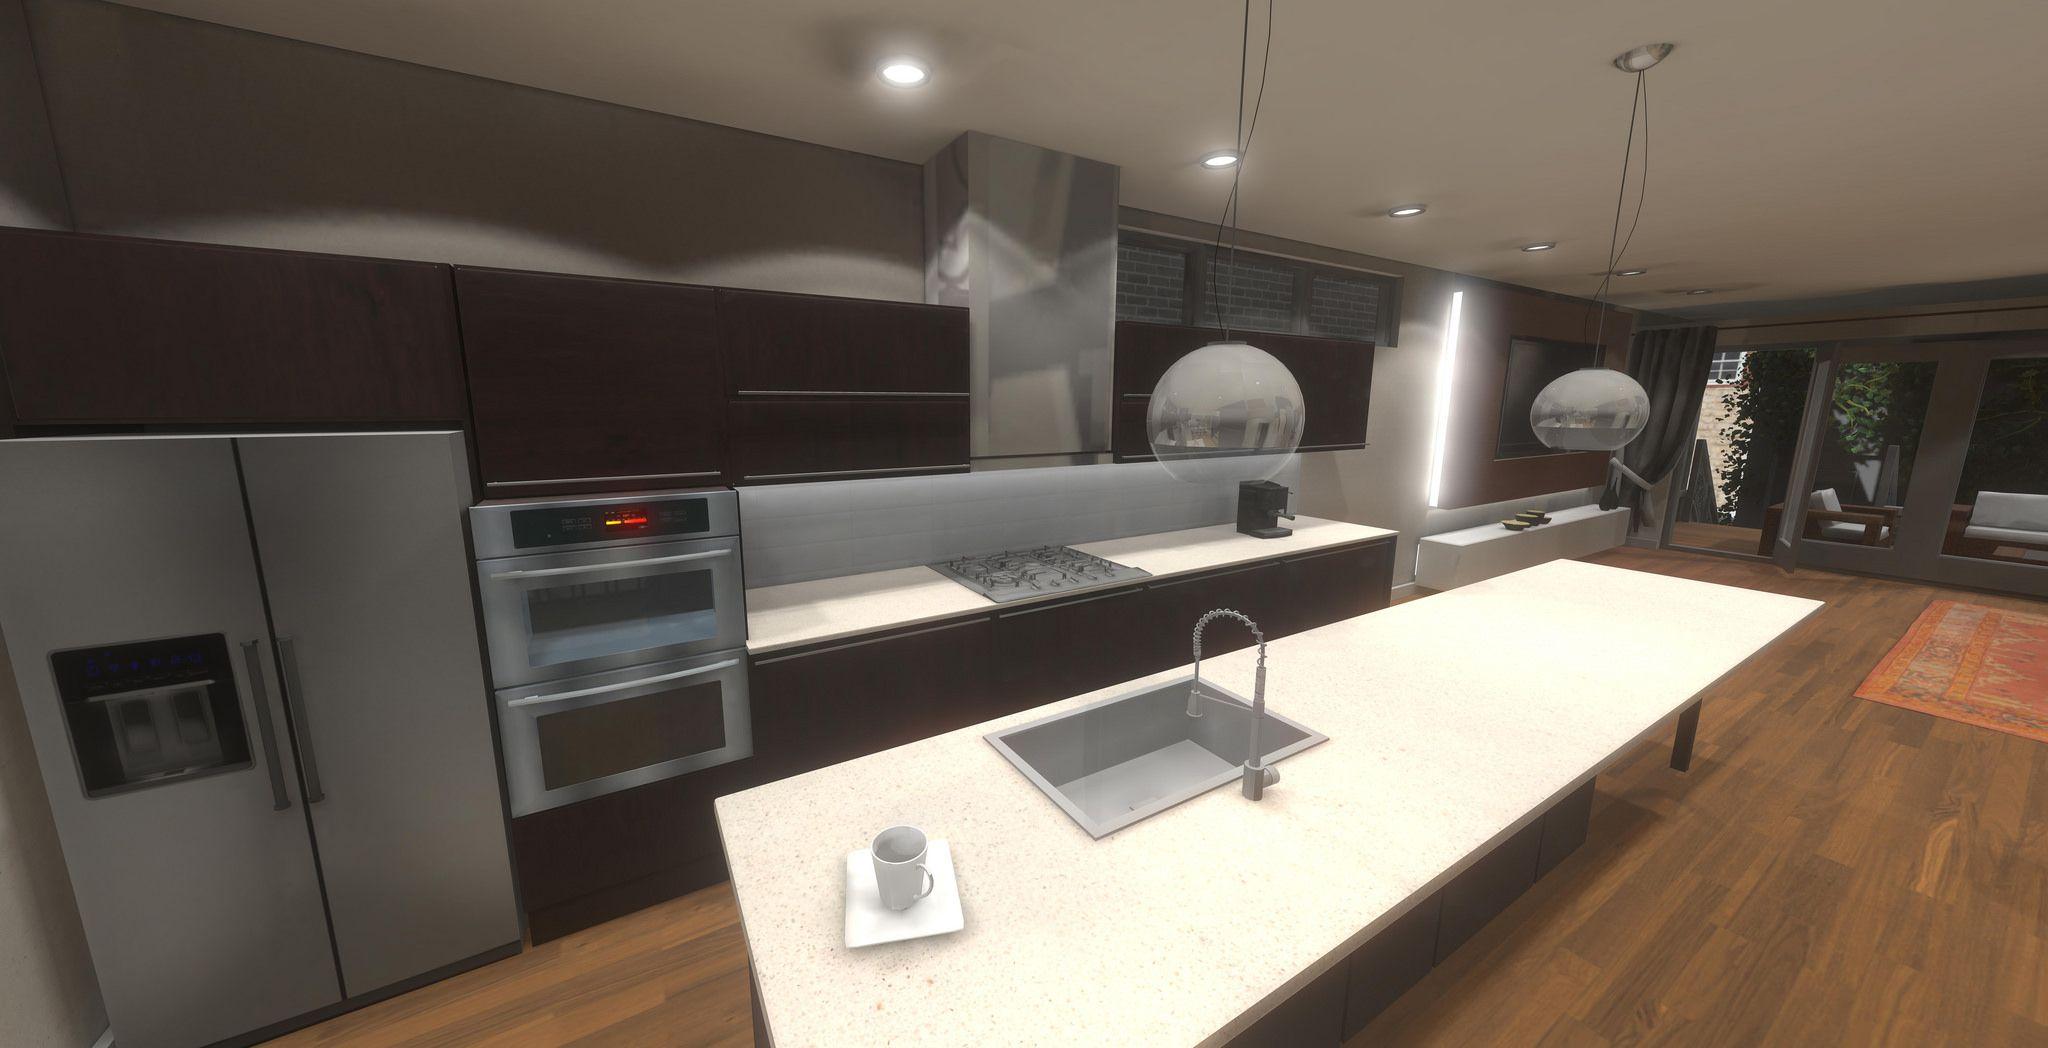 Pin by Arch Virtual on Oculus Rift Virtual Reality